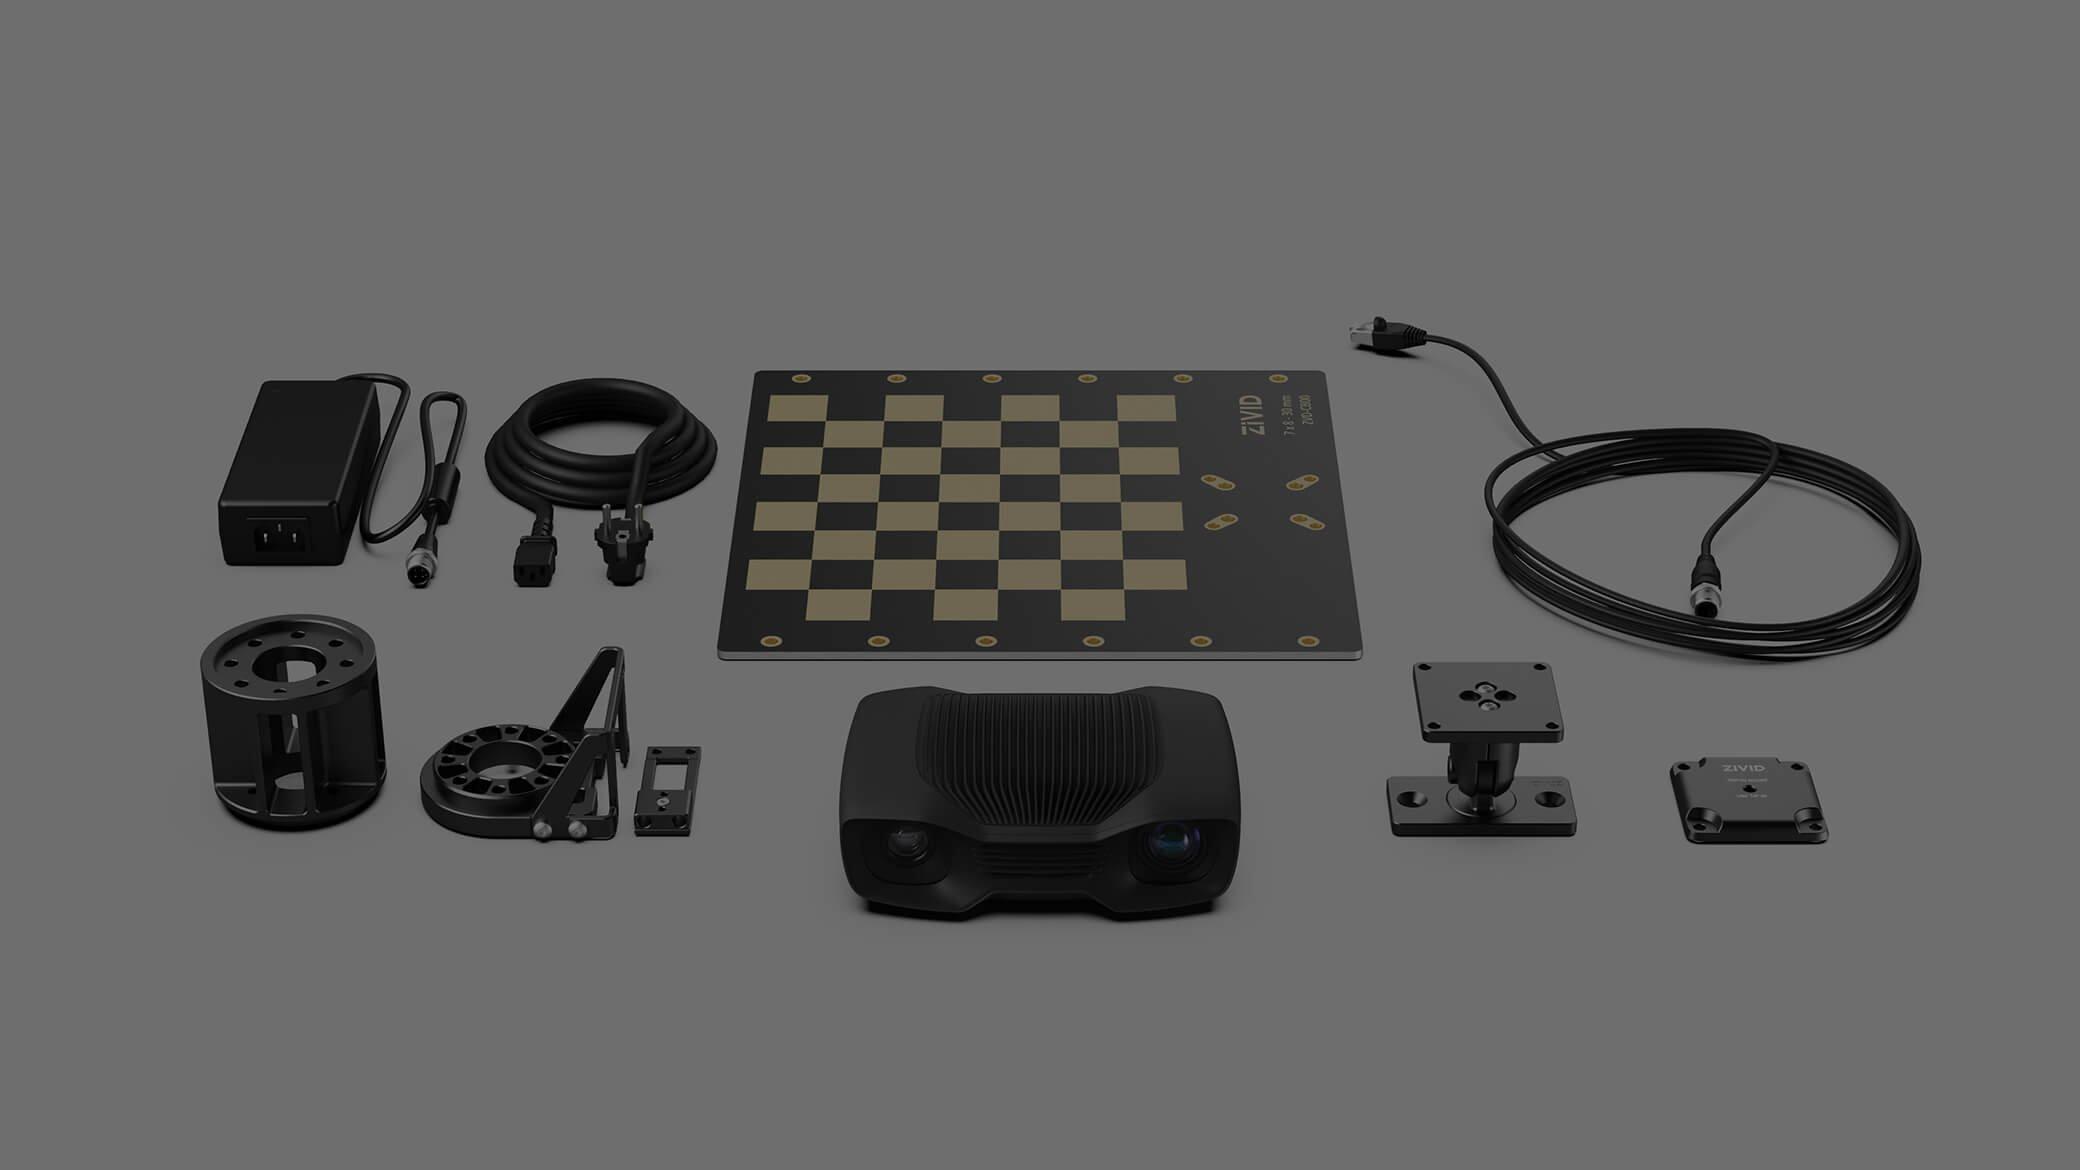 Zivid 3D developer kit bundle